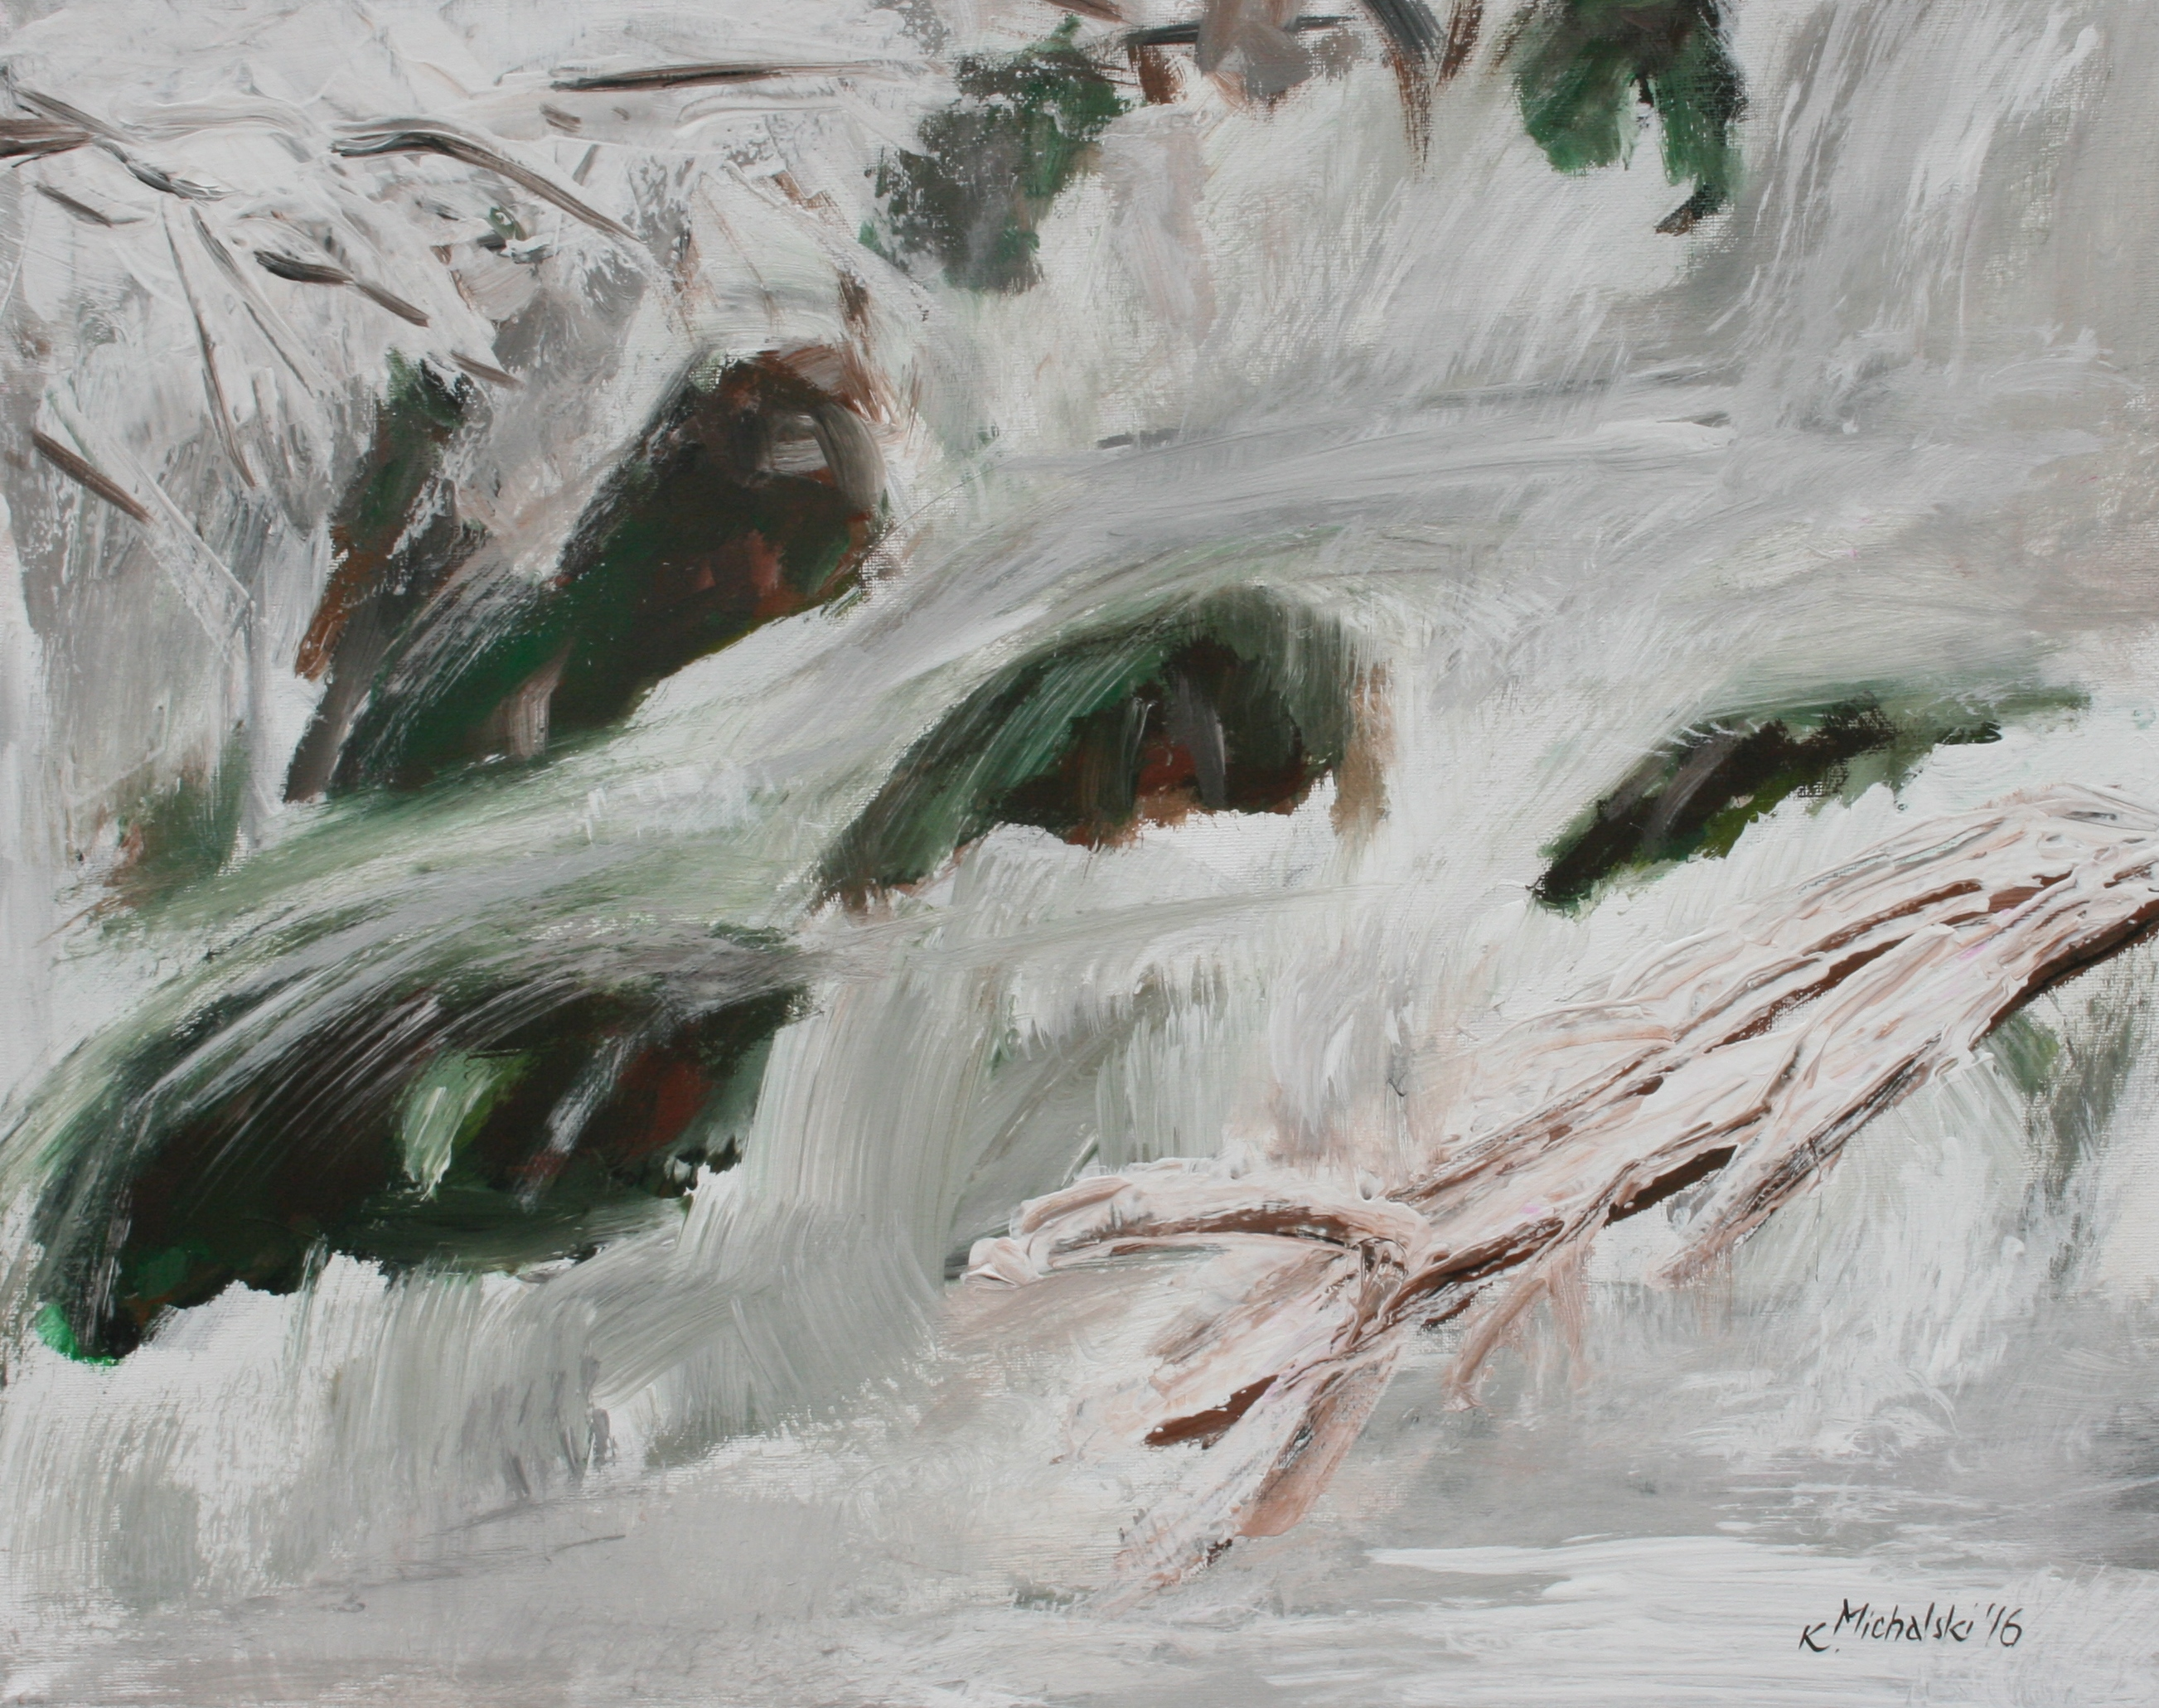 Winterbach, 2016, 40 x 50, Acryl auf Leinwand